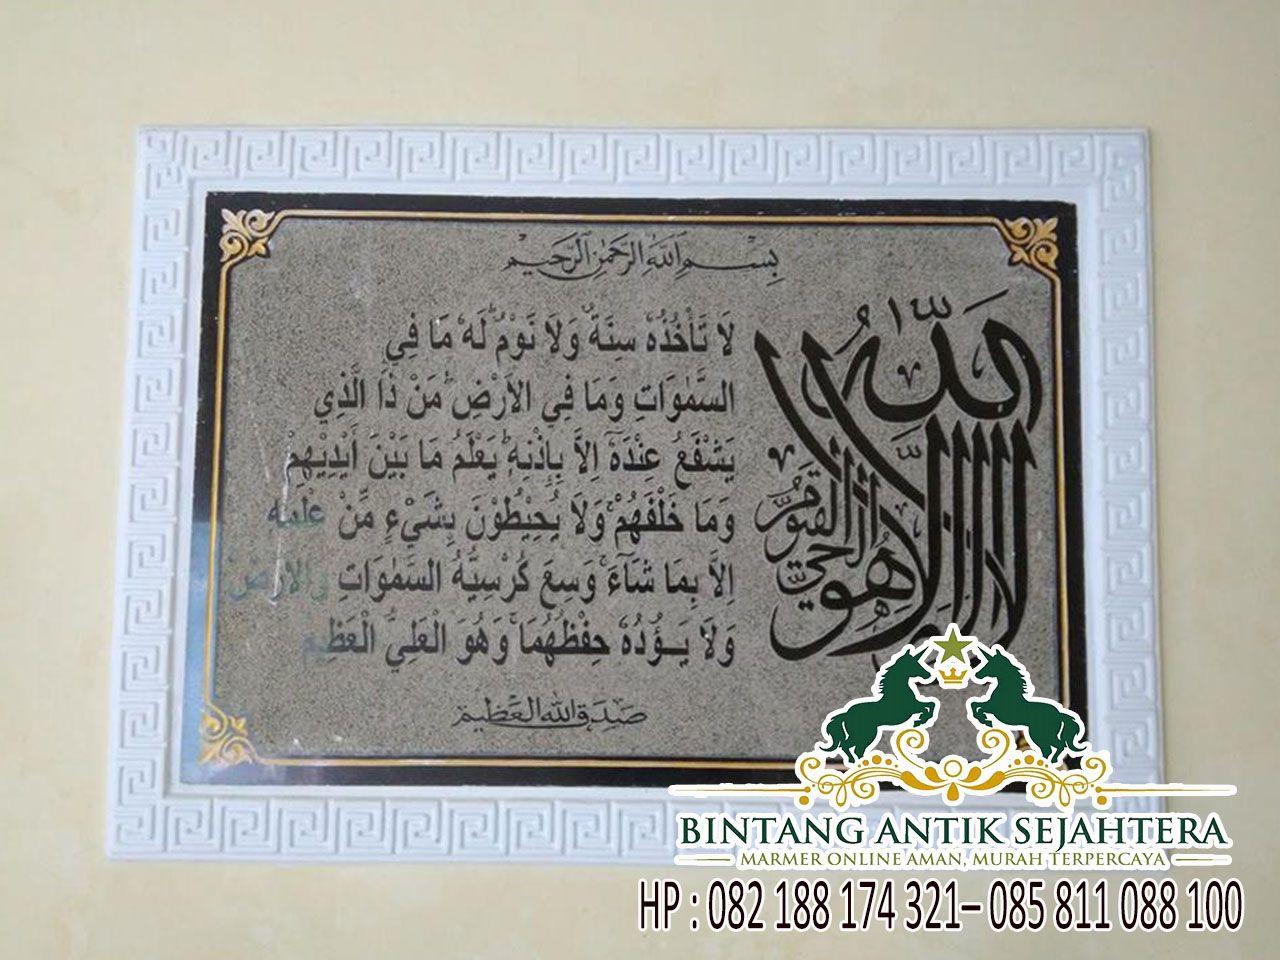 kir Nama Di Marmer, Contoh Prasasti, Kaligrafi Prasasti